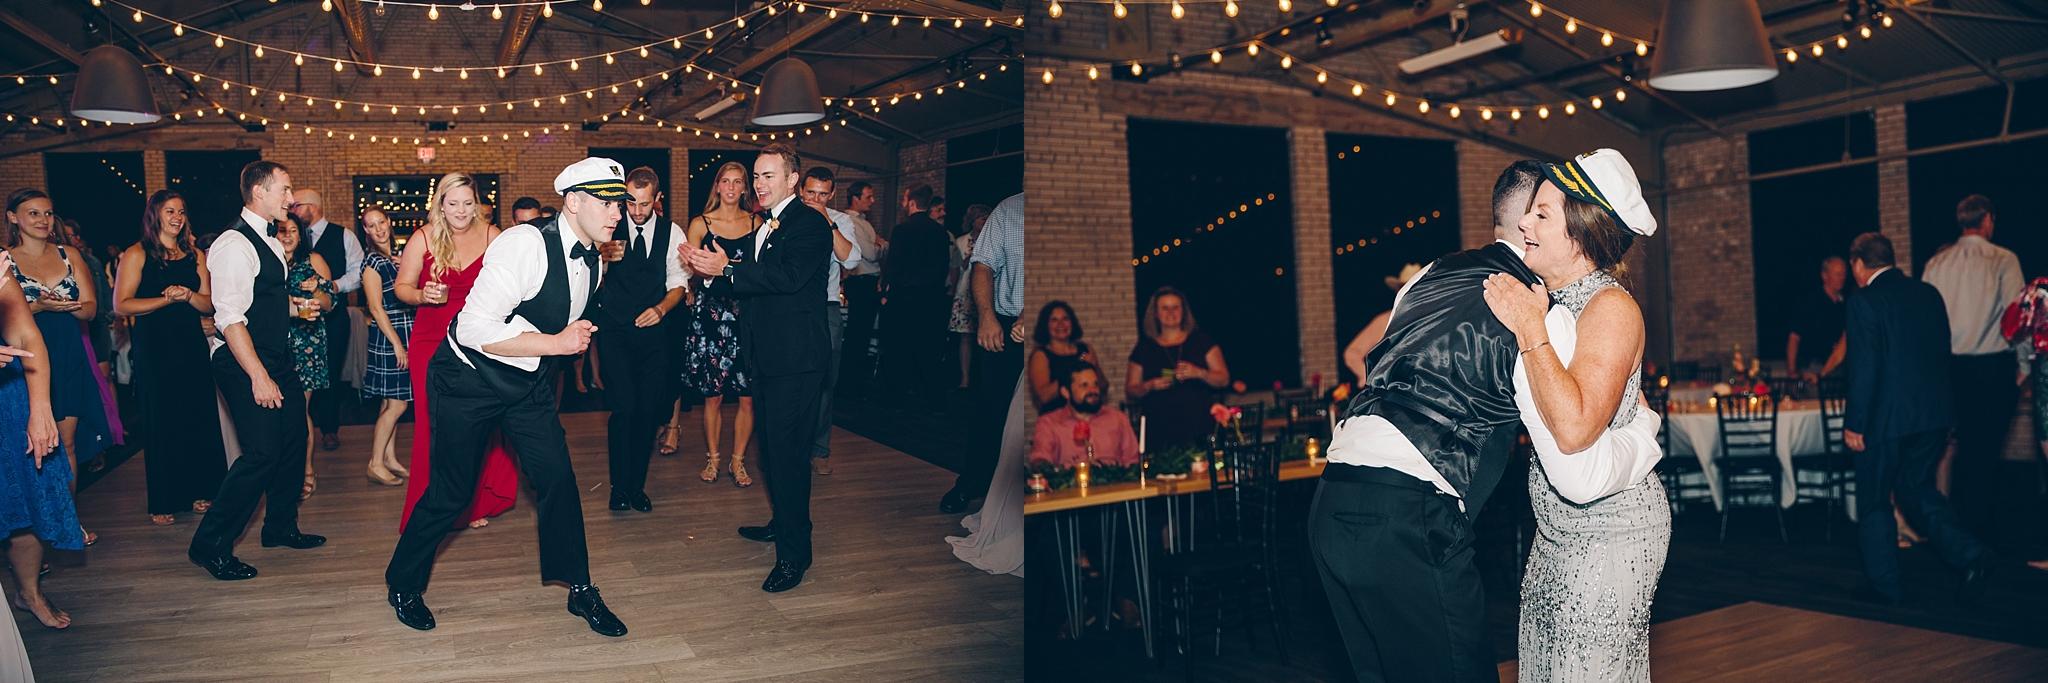 baker-lofts-holland-michigan-wedding-photographer_0409.jpg